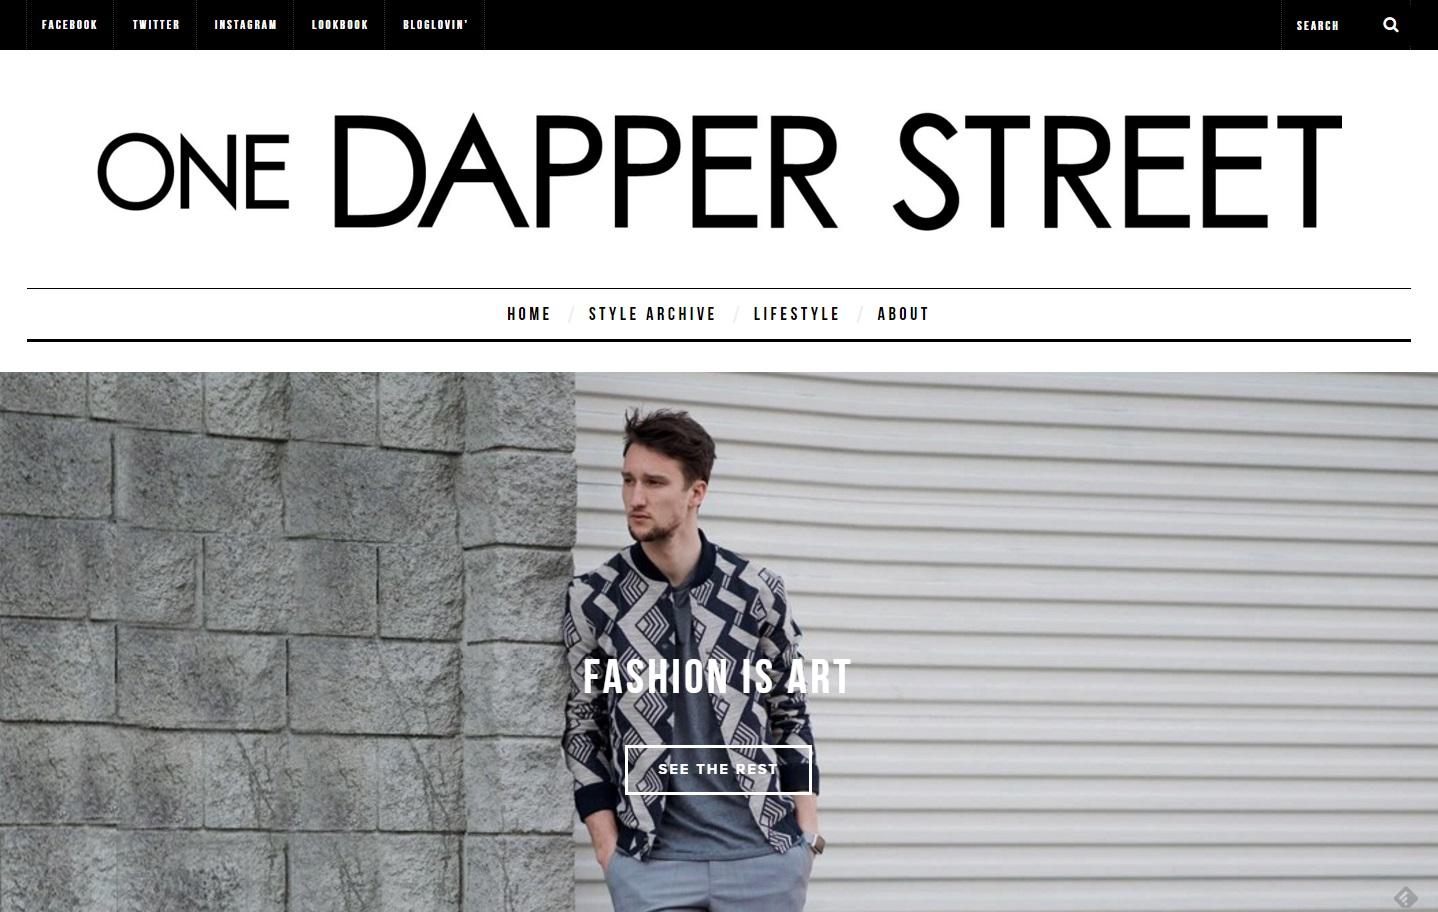 One Dapper Street by Marcel Floruss